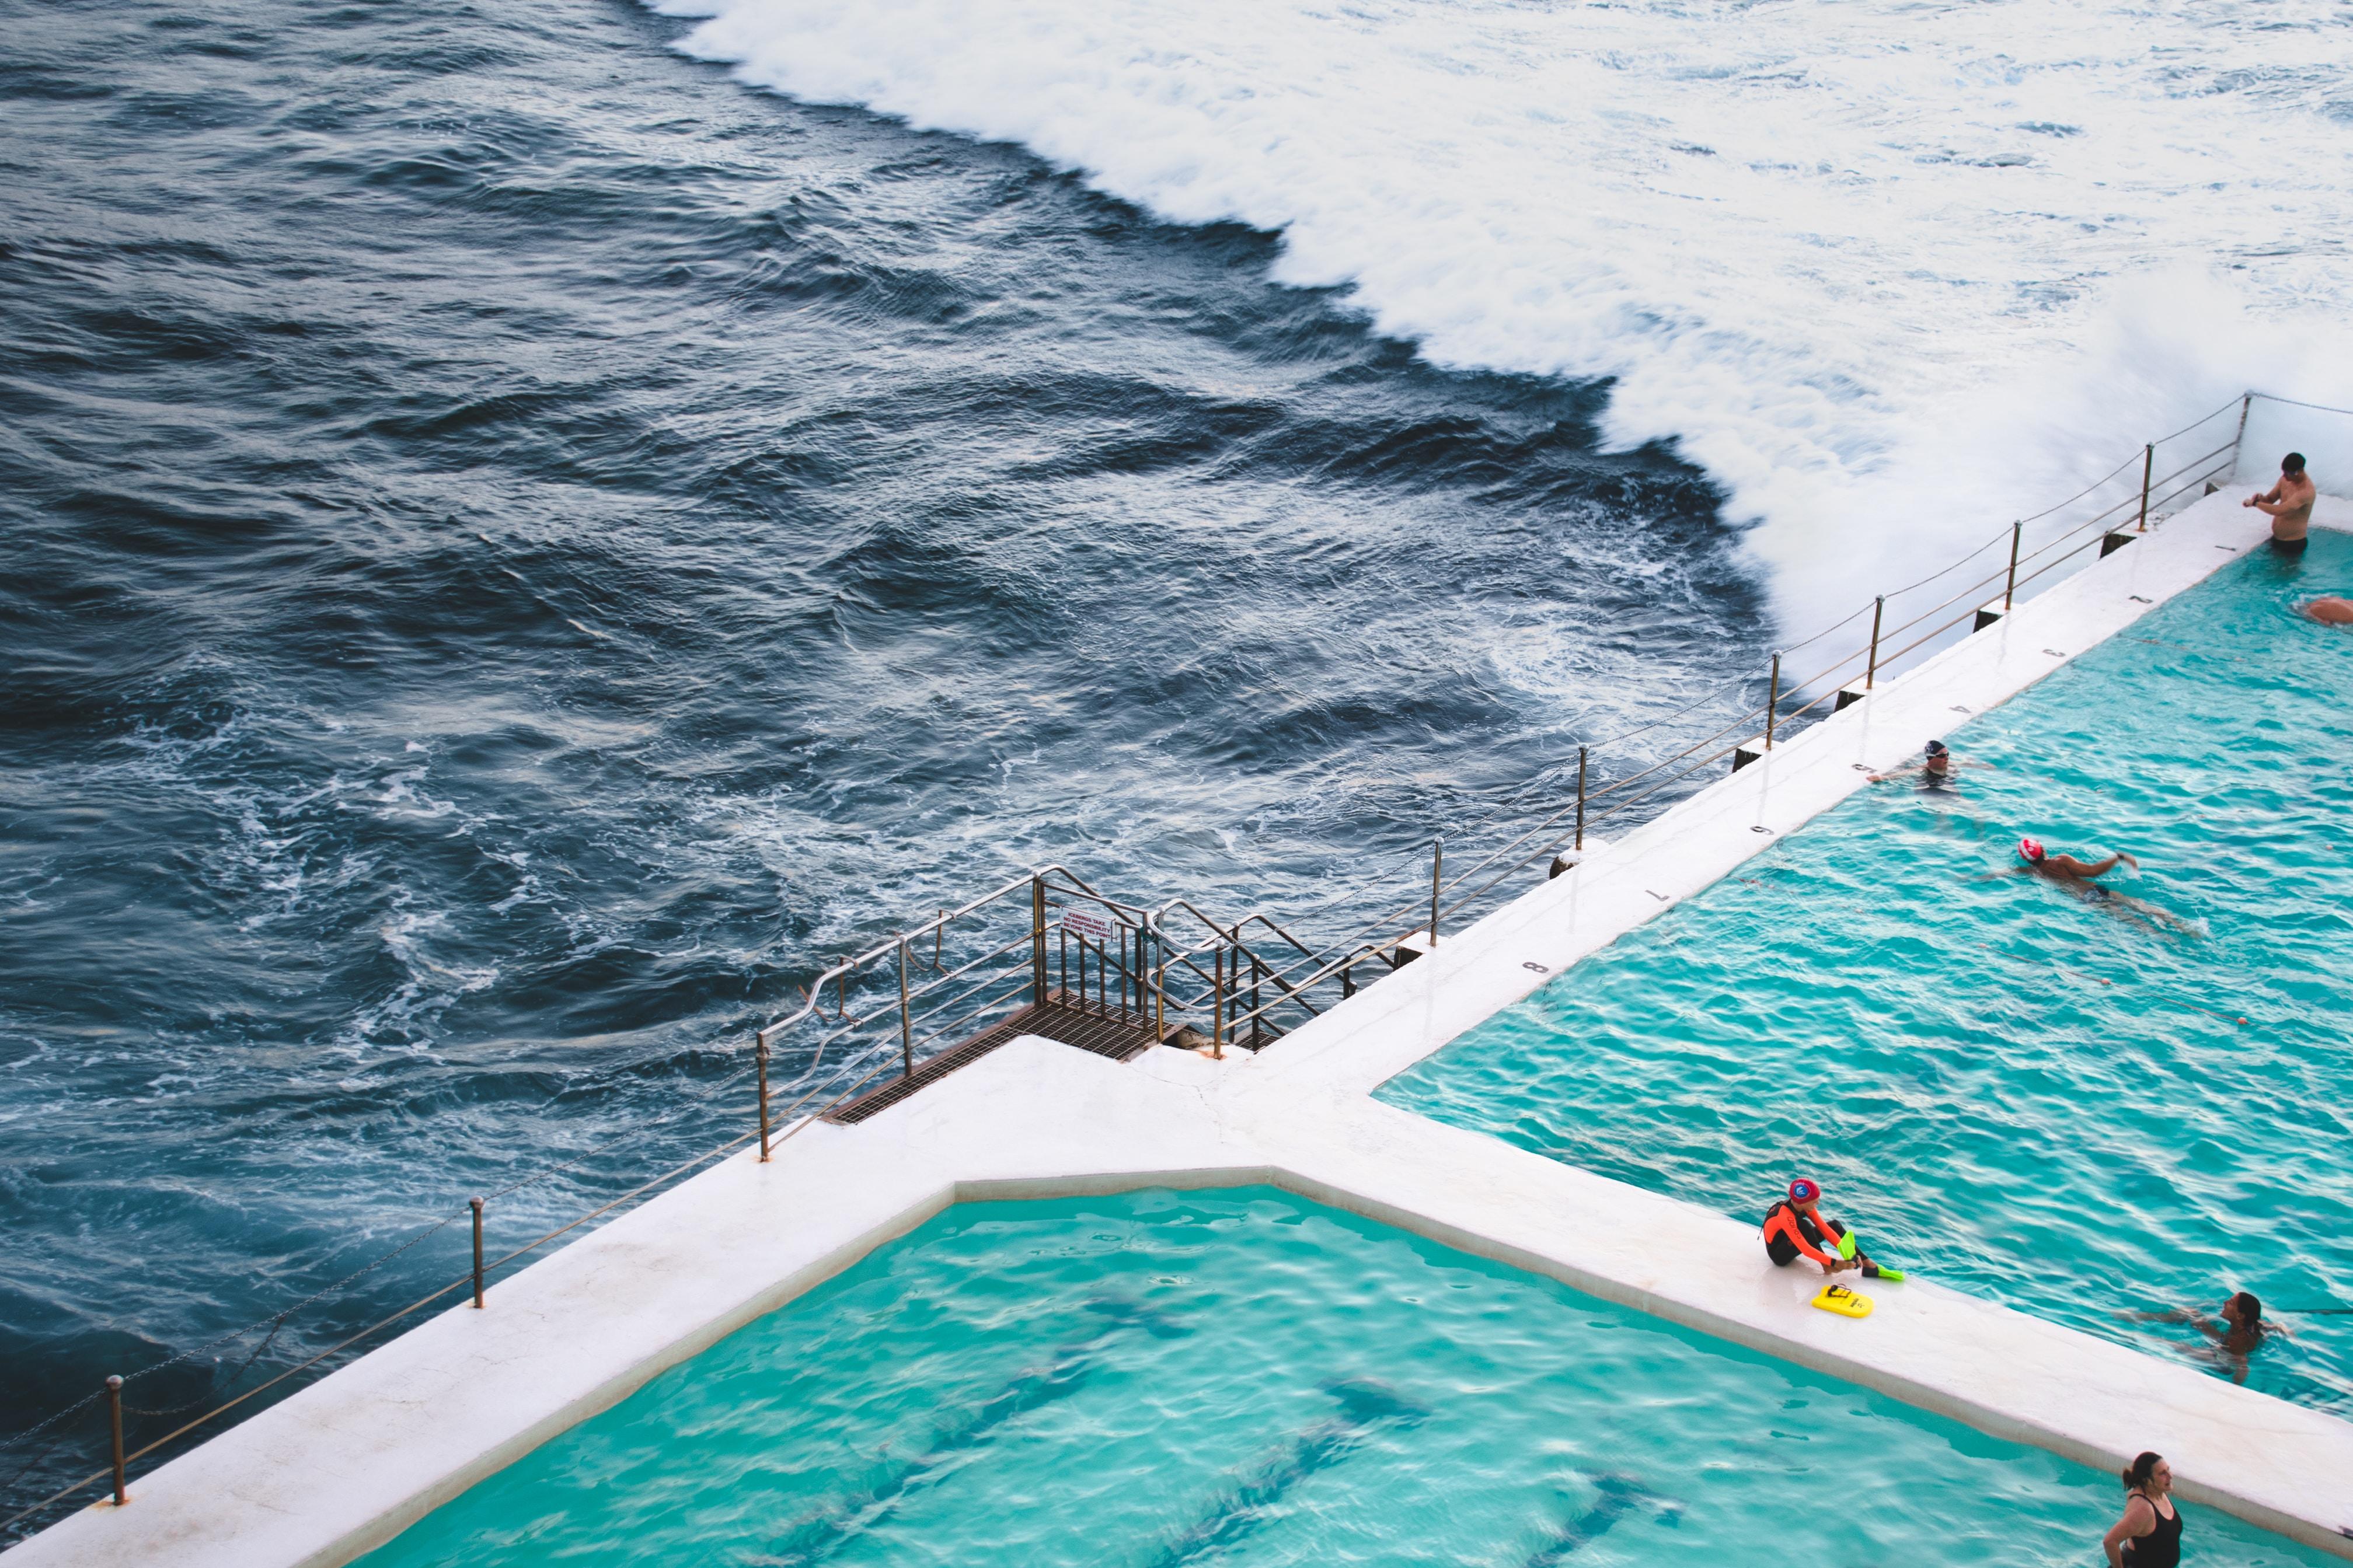 people swimming in pool near sea during daytime